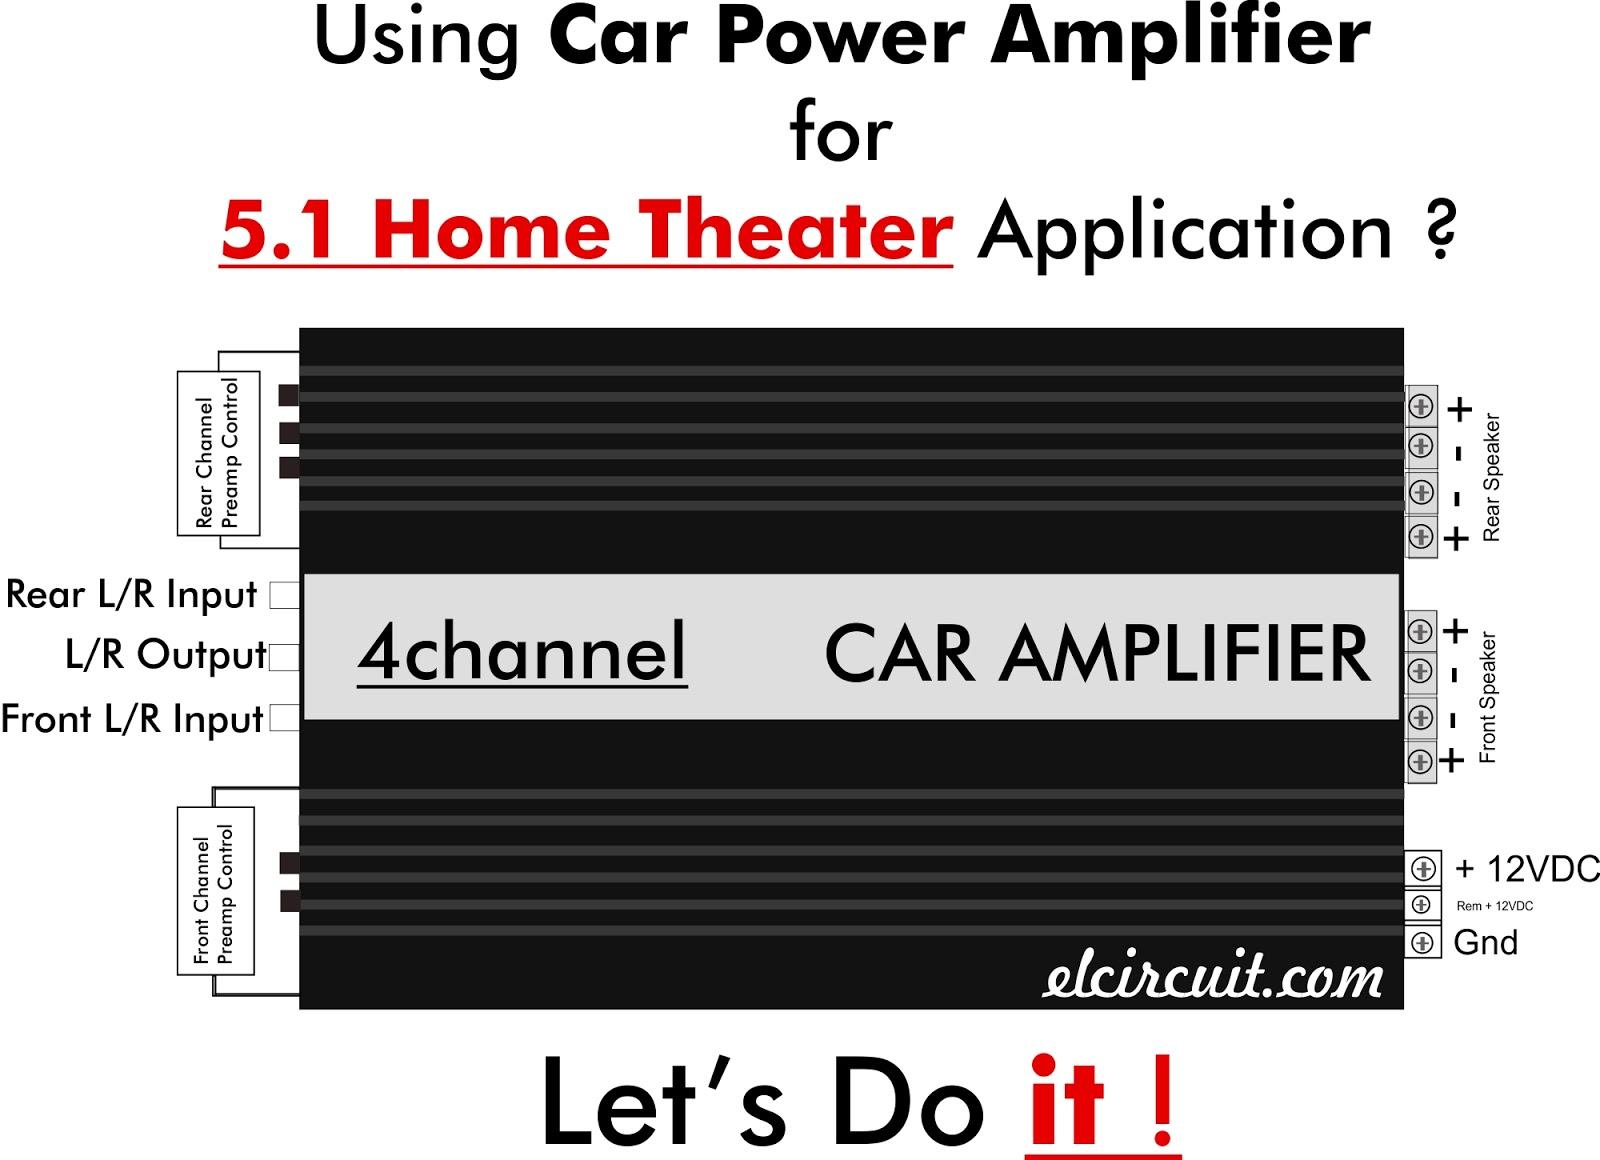 medium resolution of 5 1 home theater using car power amplifier